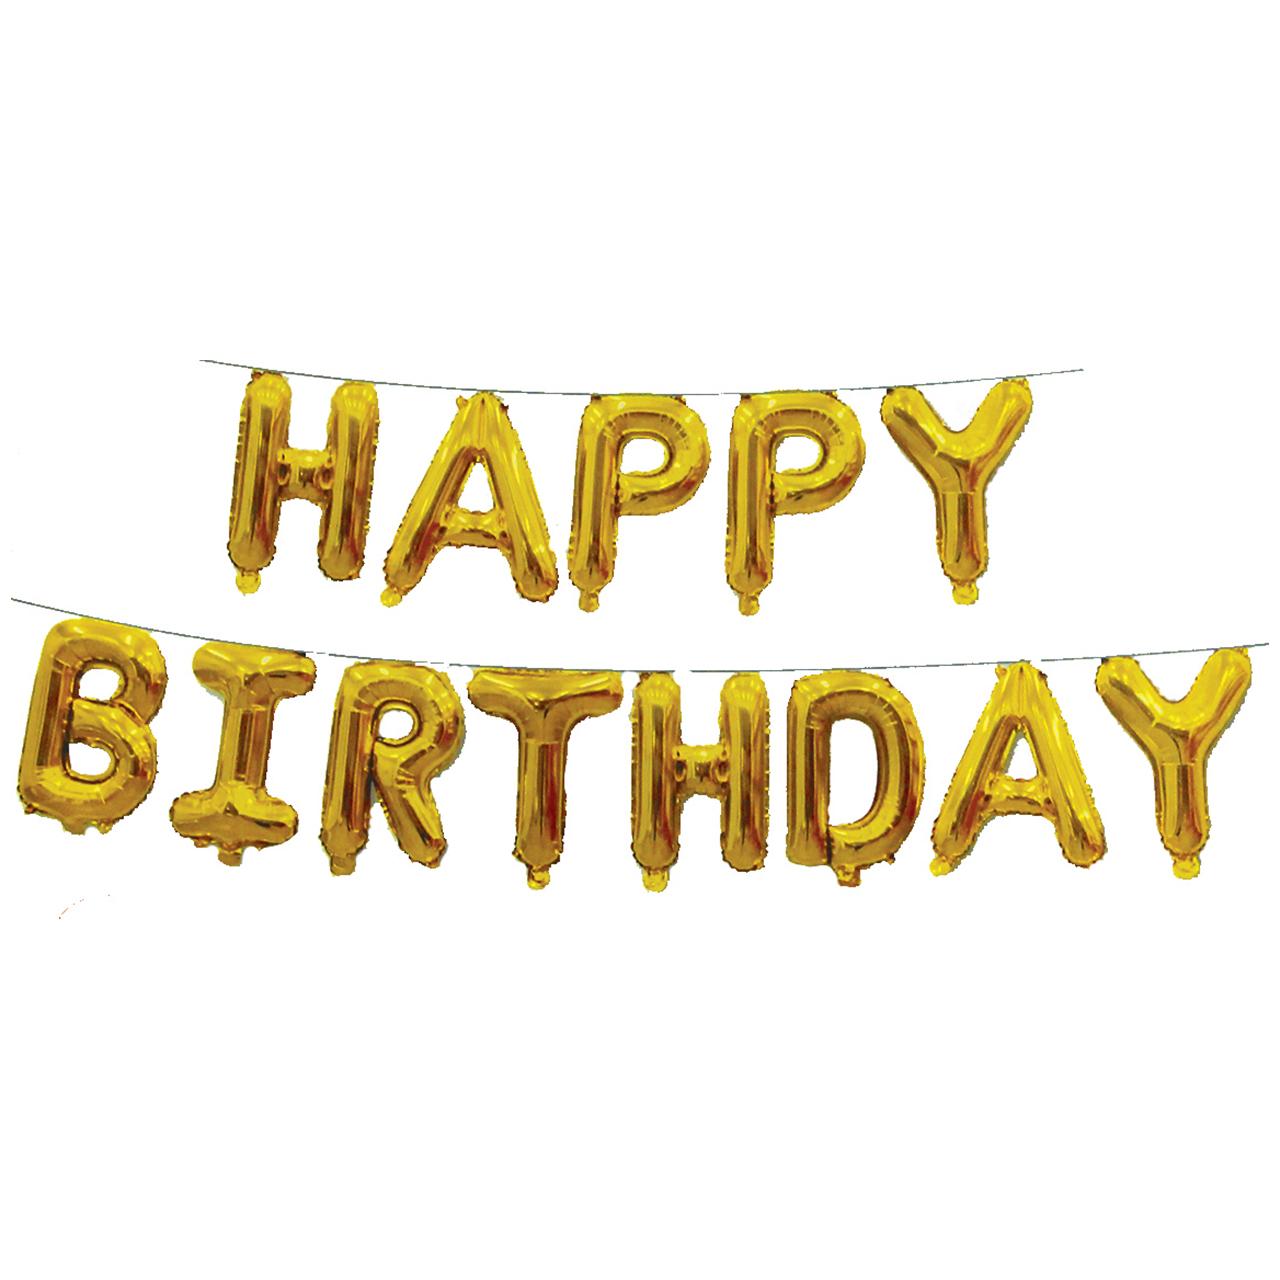 بادکنک فویلی مدل هپی برزدی (Happy Birthday)